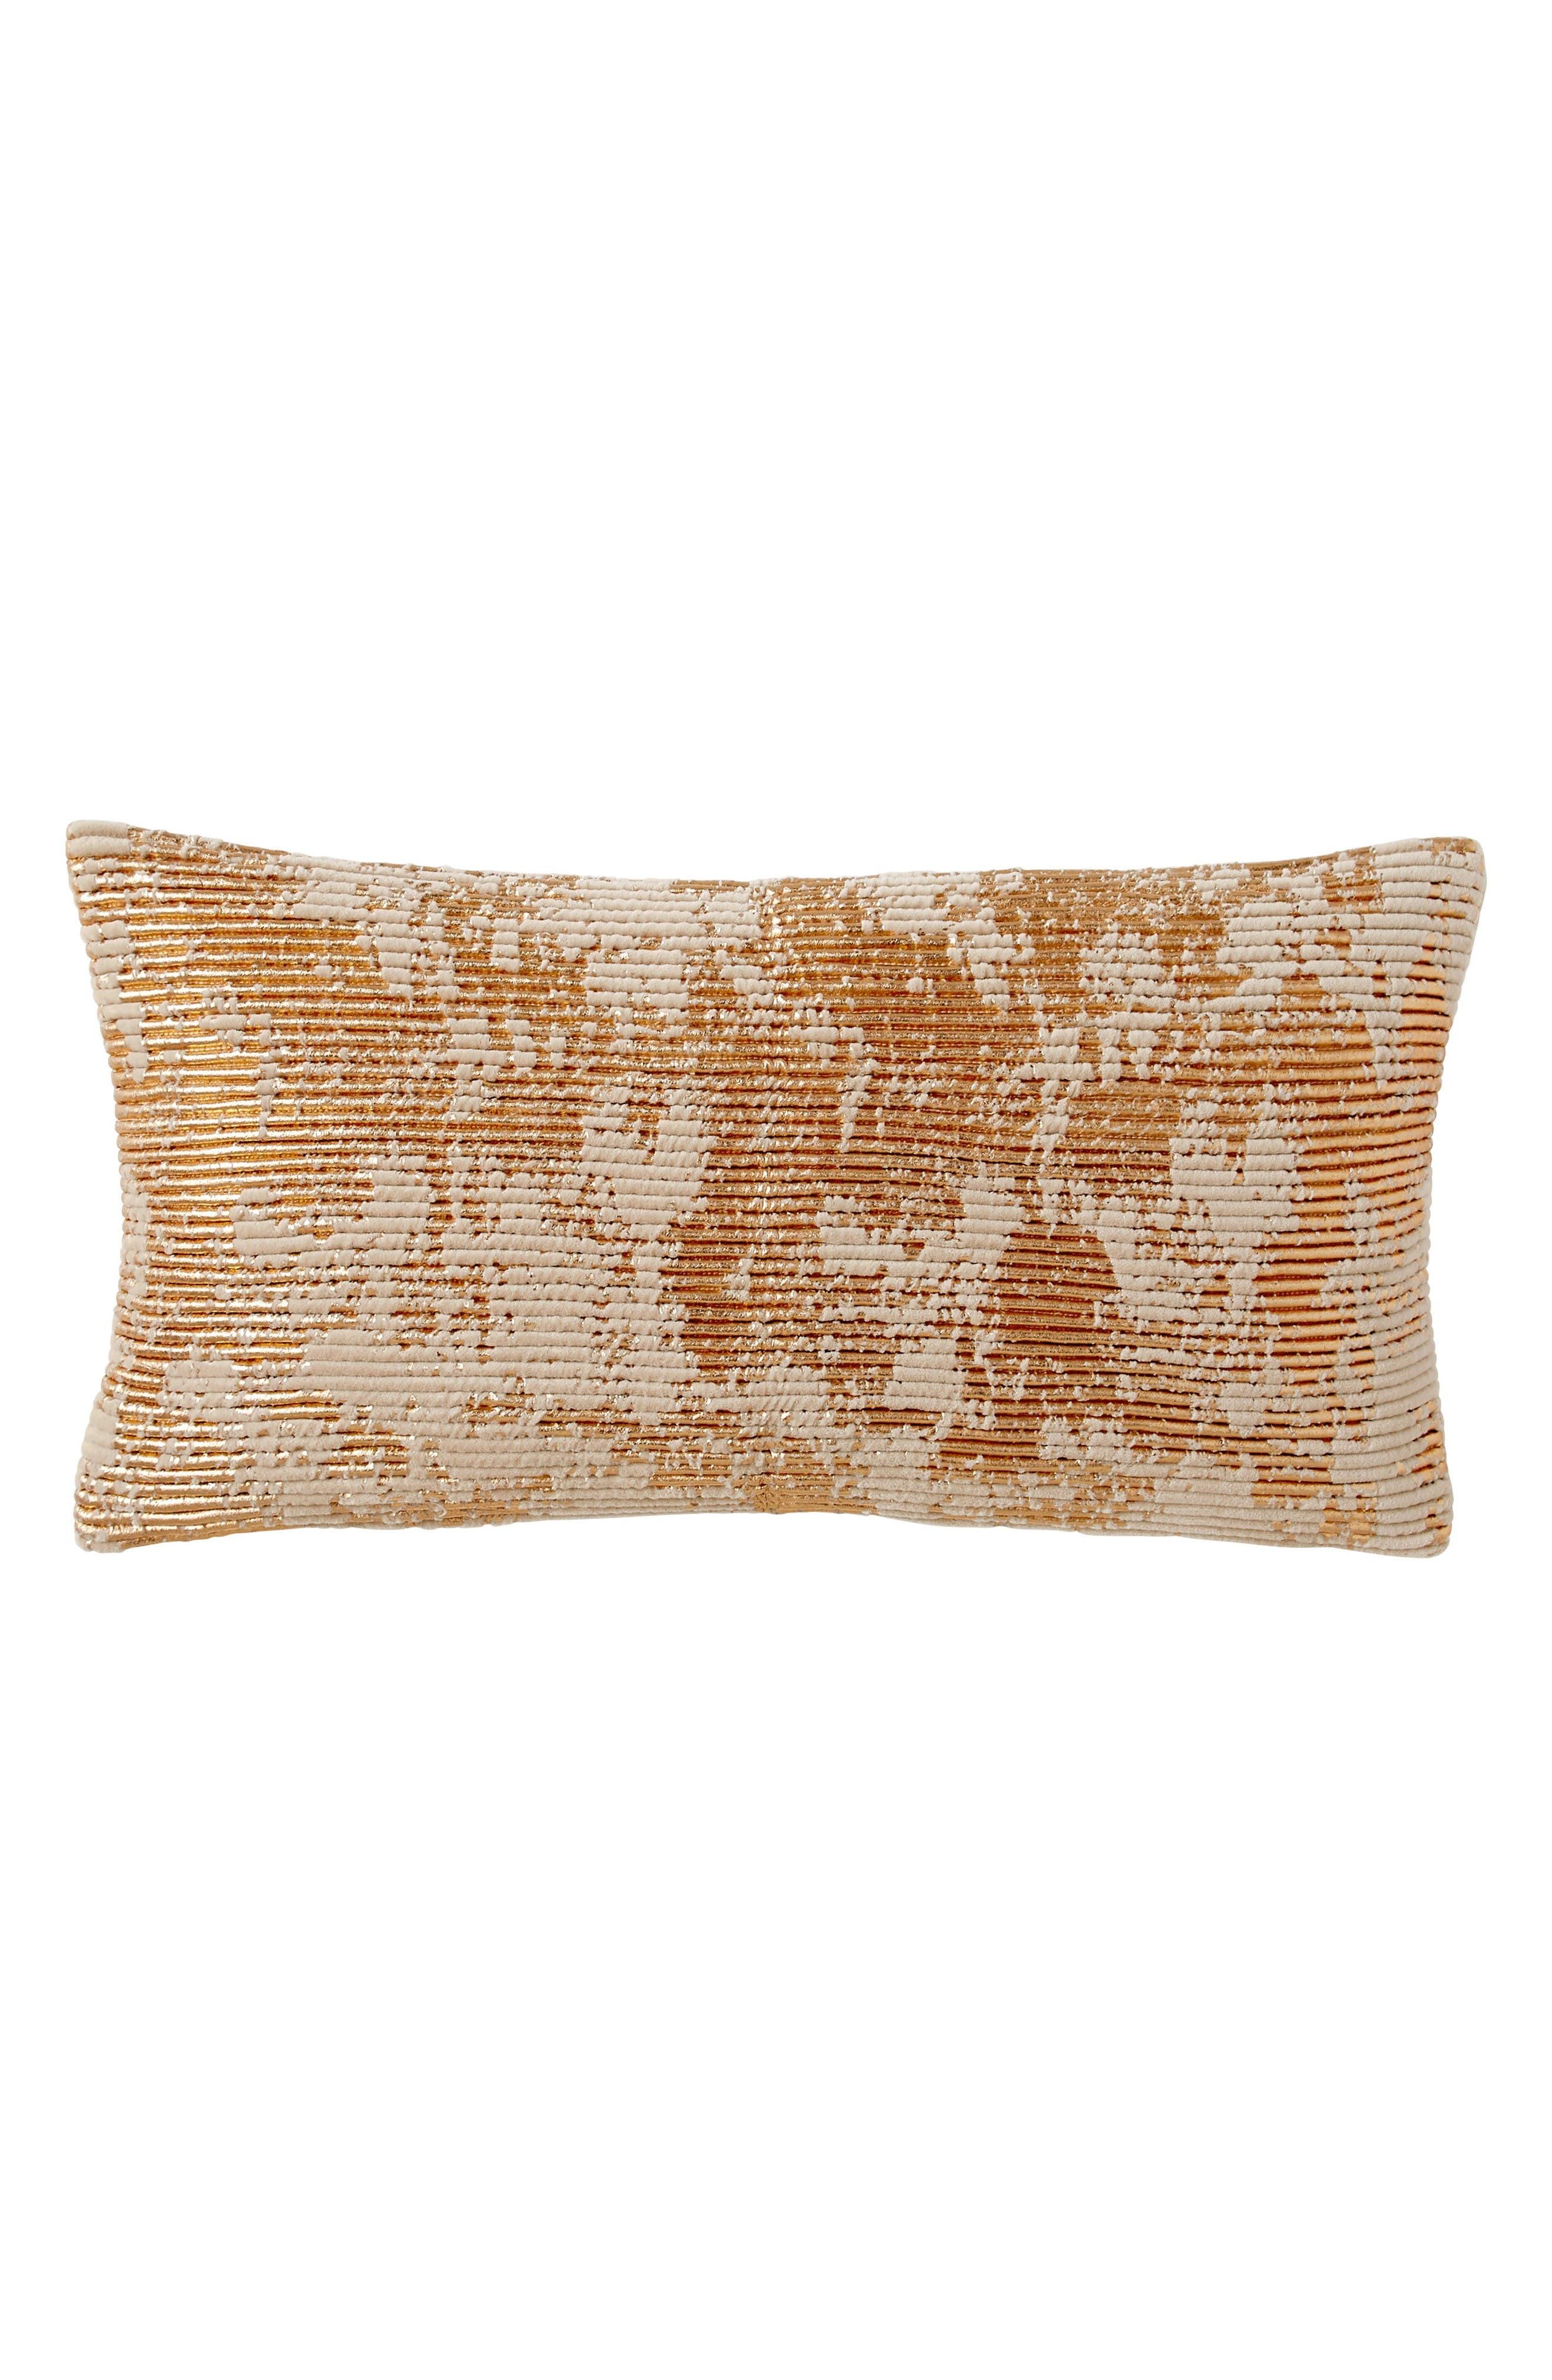 Donna Karan Homoe Collection Awakening Velvet Accent Pillow